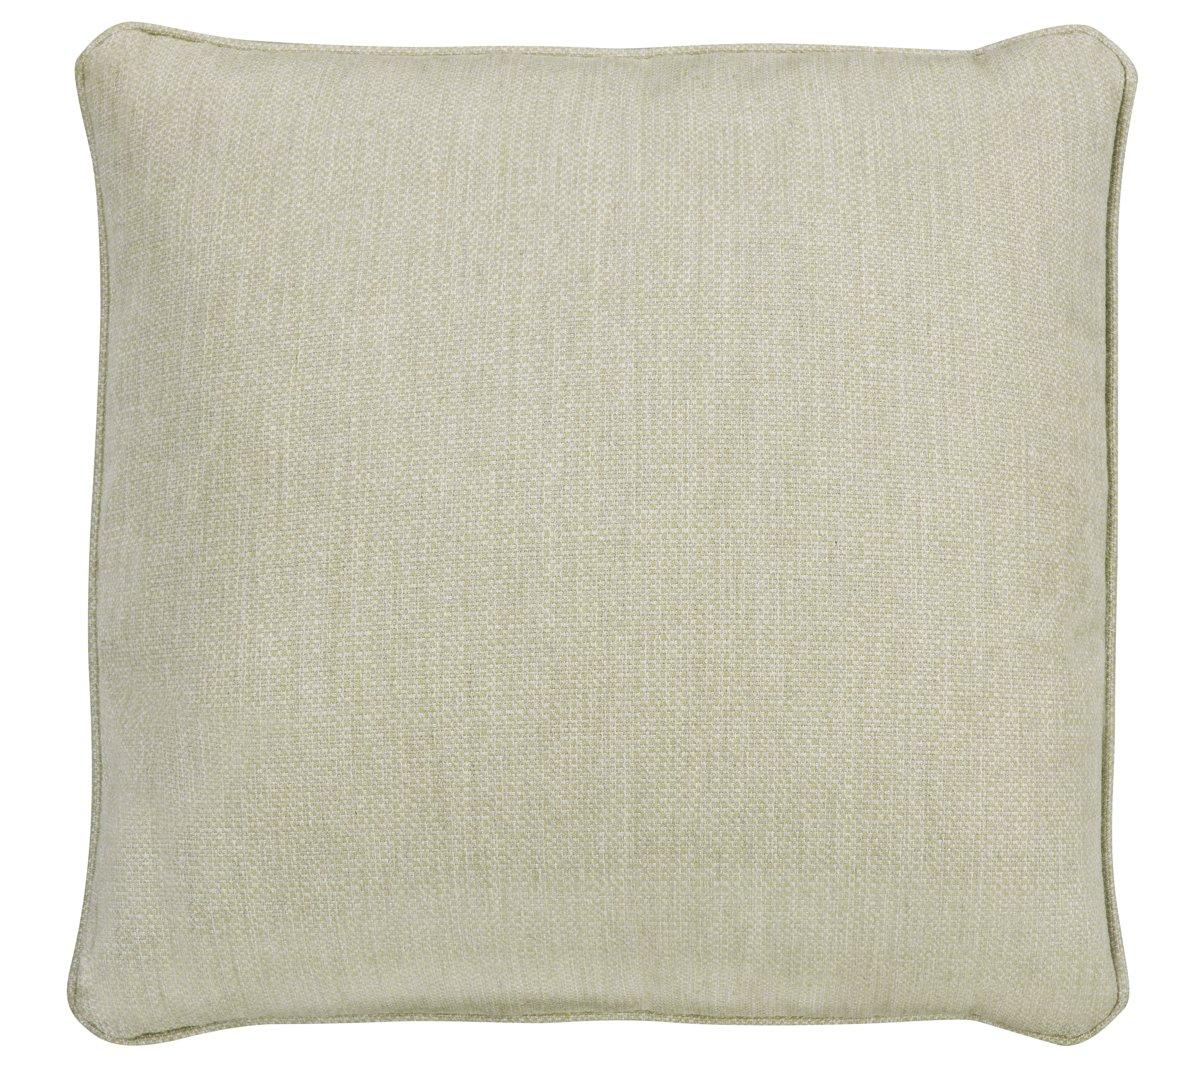 "Moka Light Green 18"" Indoor/Outdoor Accent Pillow"